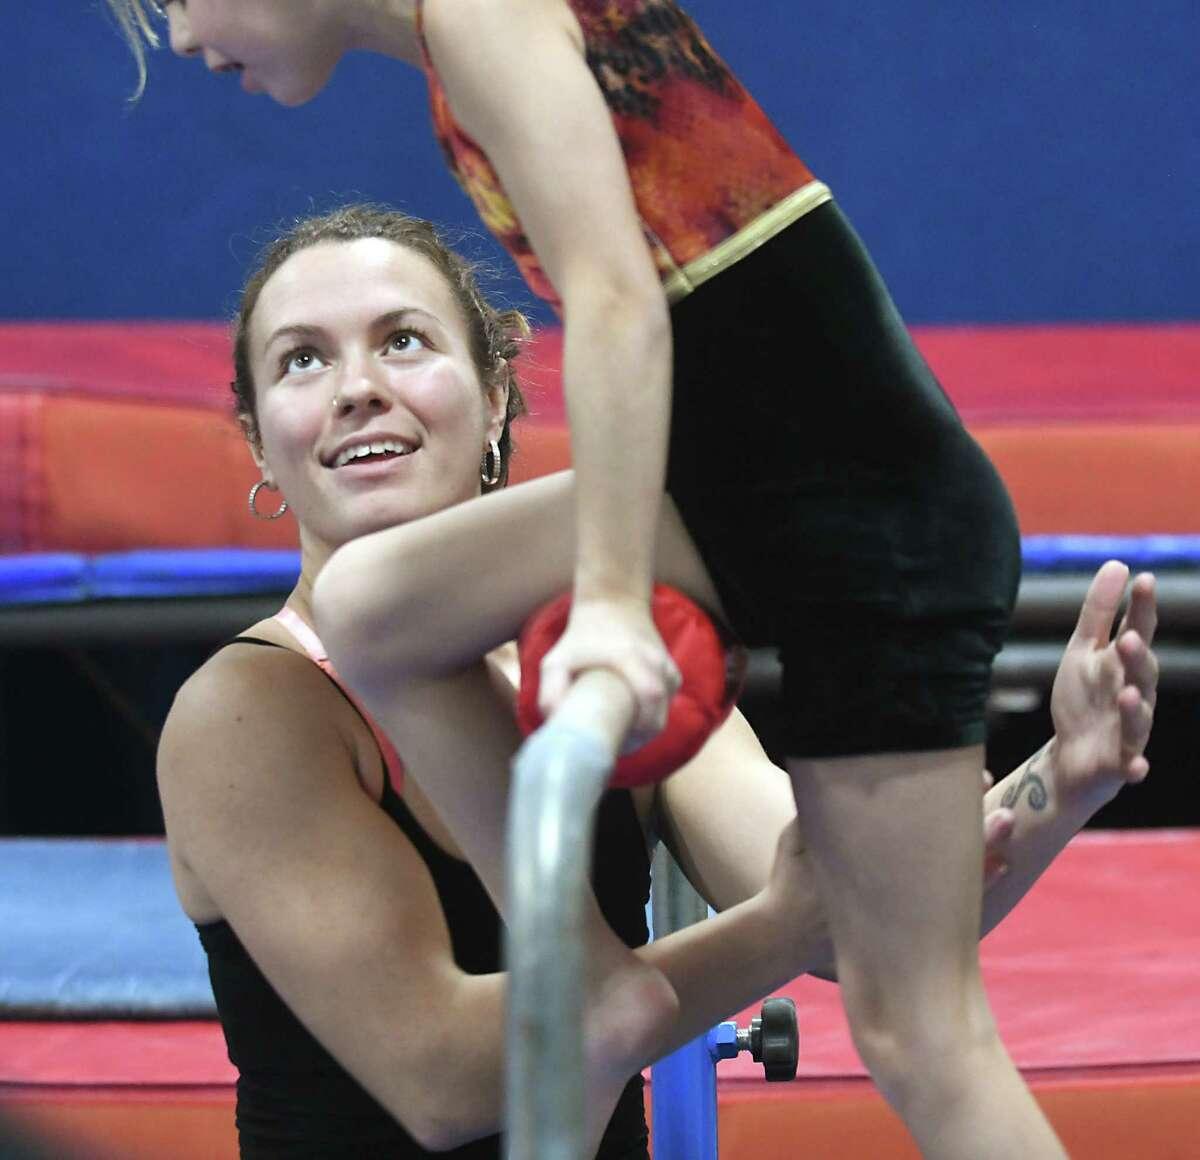 Megan Kennedy, 25, works with 8-yr-old Allison Barnett in DC Stars Gymnastics Academy on Thursday, Dec. 21, 2017 in Watervliet, N.Y. Kennedy, a gymnast who grew up training at DC Stars Gymnastics Academy, is now the owner. (Lori Van Buren / Times Union)